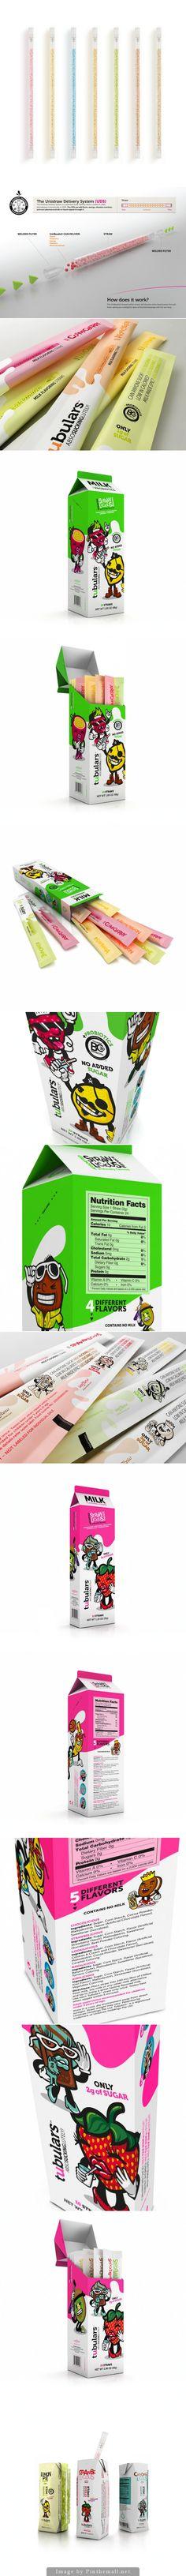 Tubulars Milk Flavoring Straws Milk Packaging, Brand Packaging, Plastic Design, Straws, Package Design, Decoration, Creative, Latte, Packing